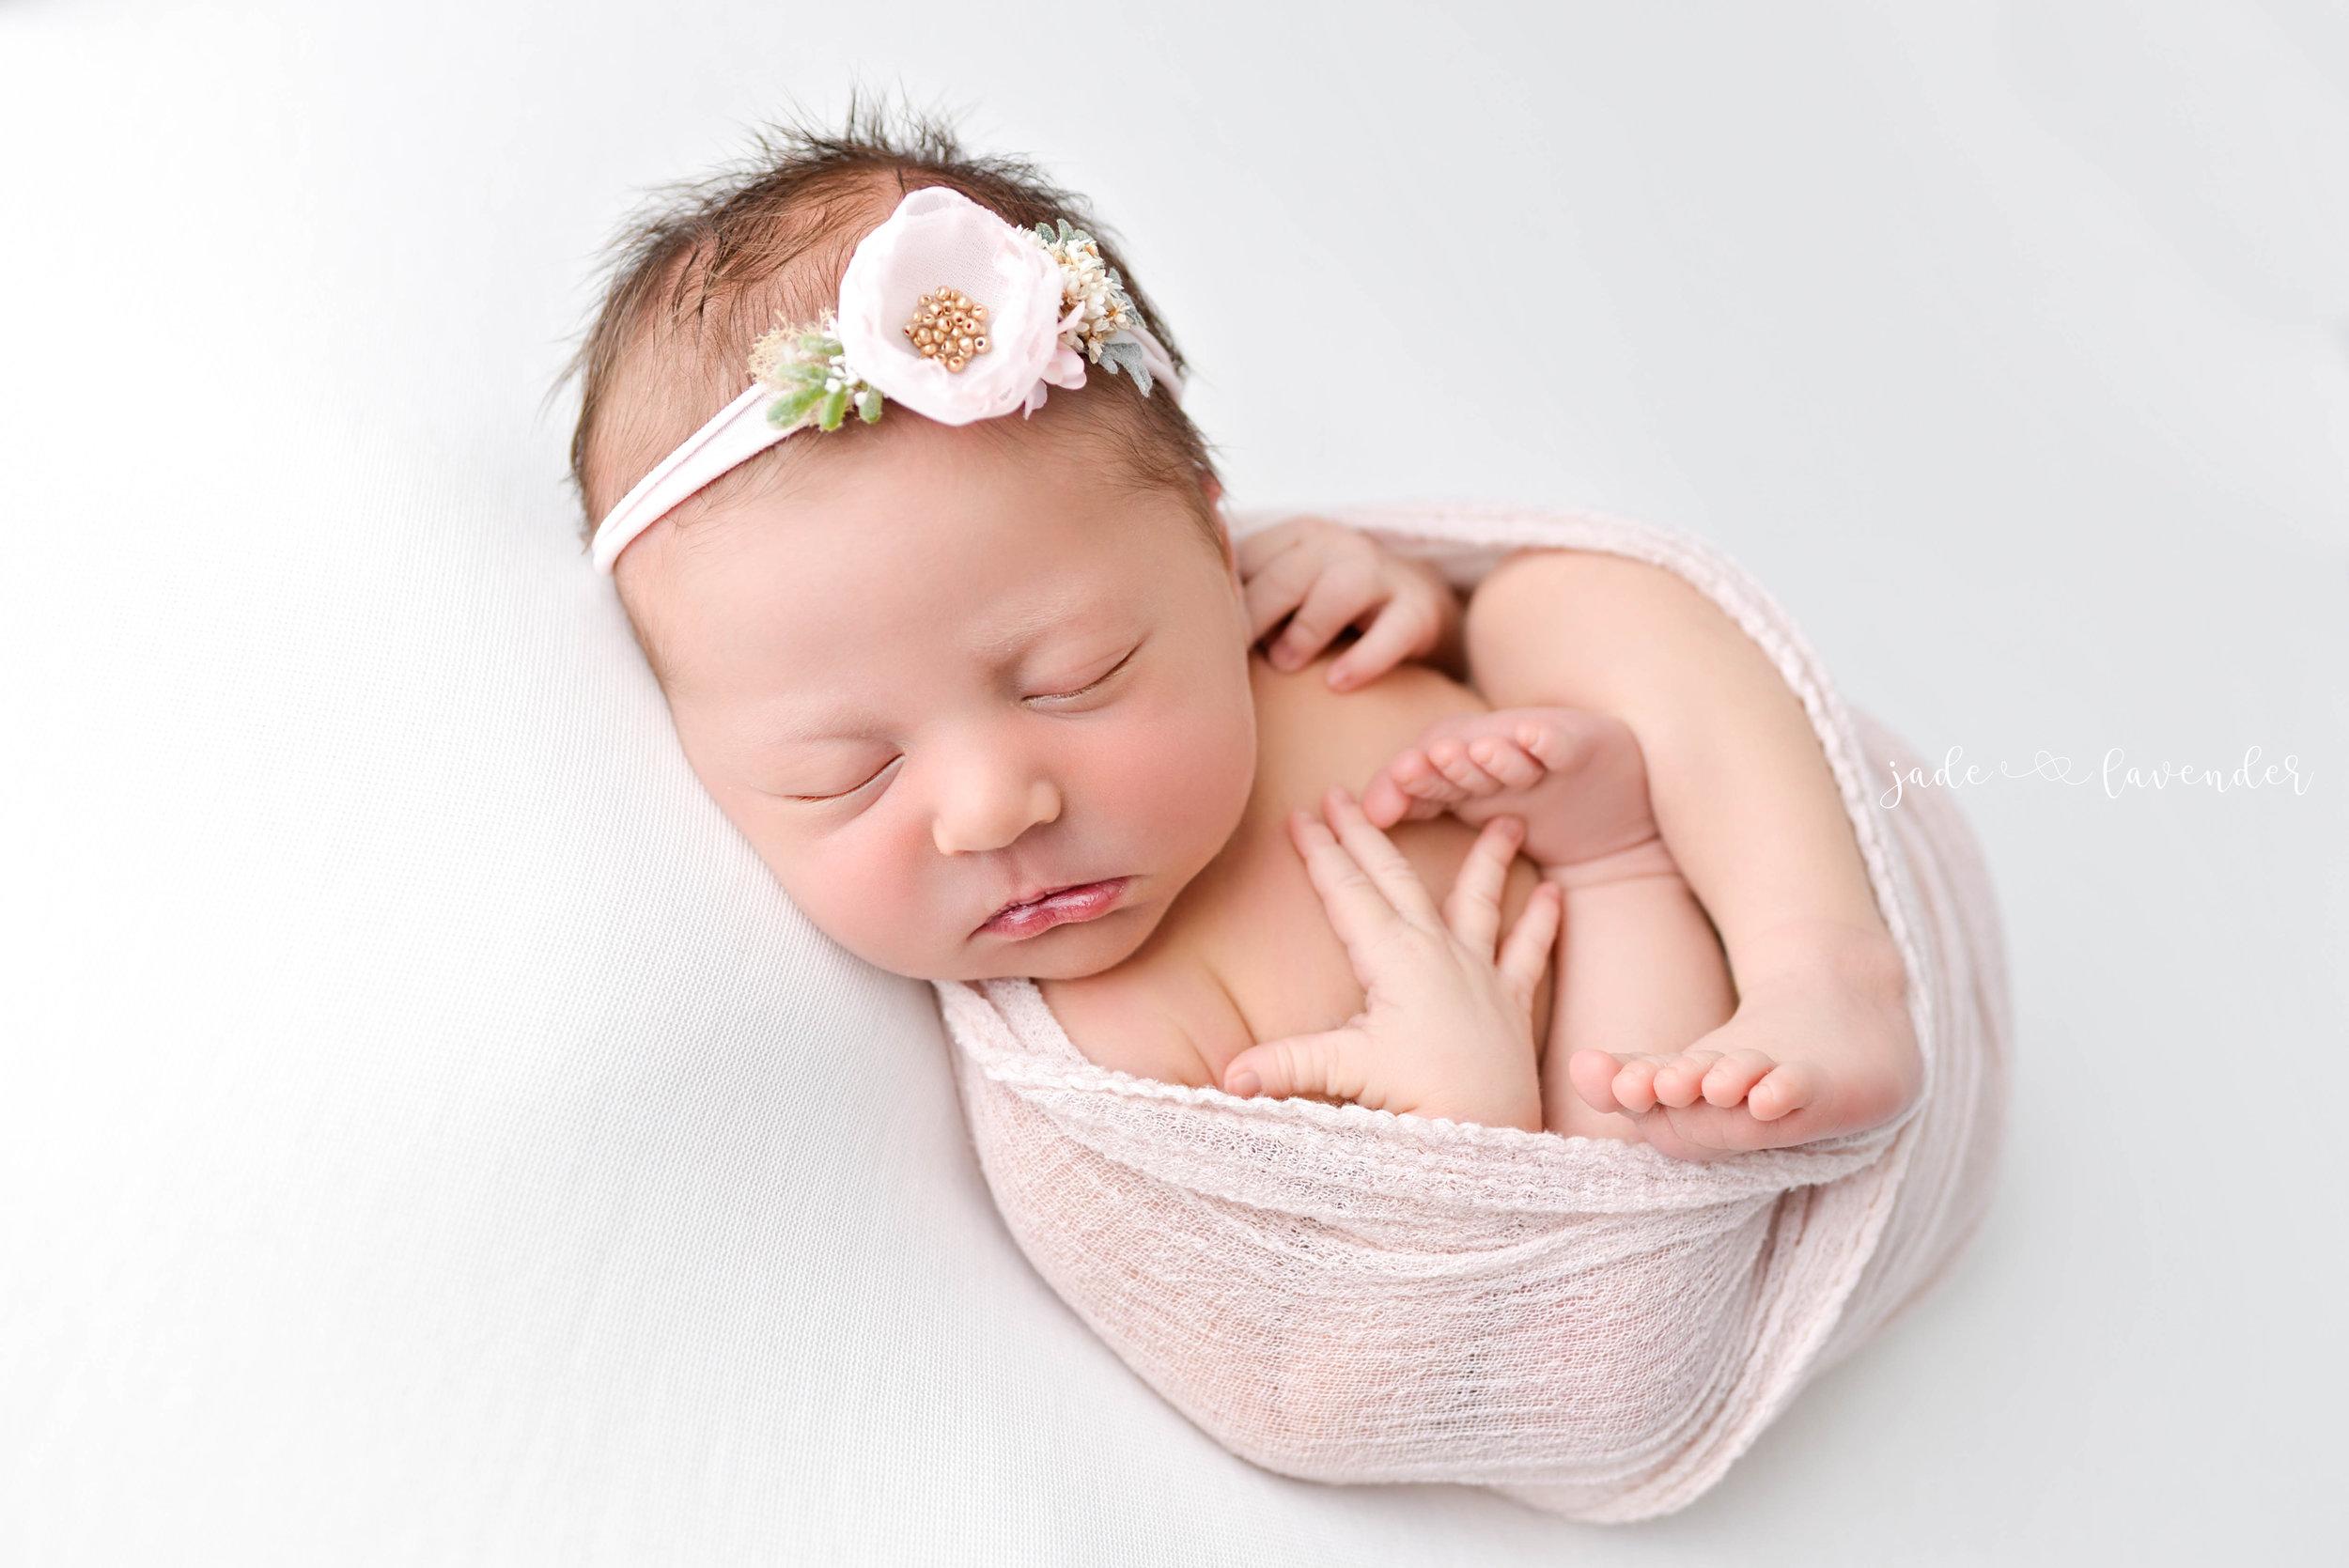 Baby-girl-pink-newborn-photography-infant-images-baby-photos-photographer-spokane-washington (1 of 8).jpg